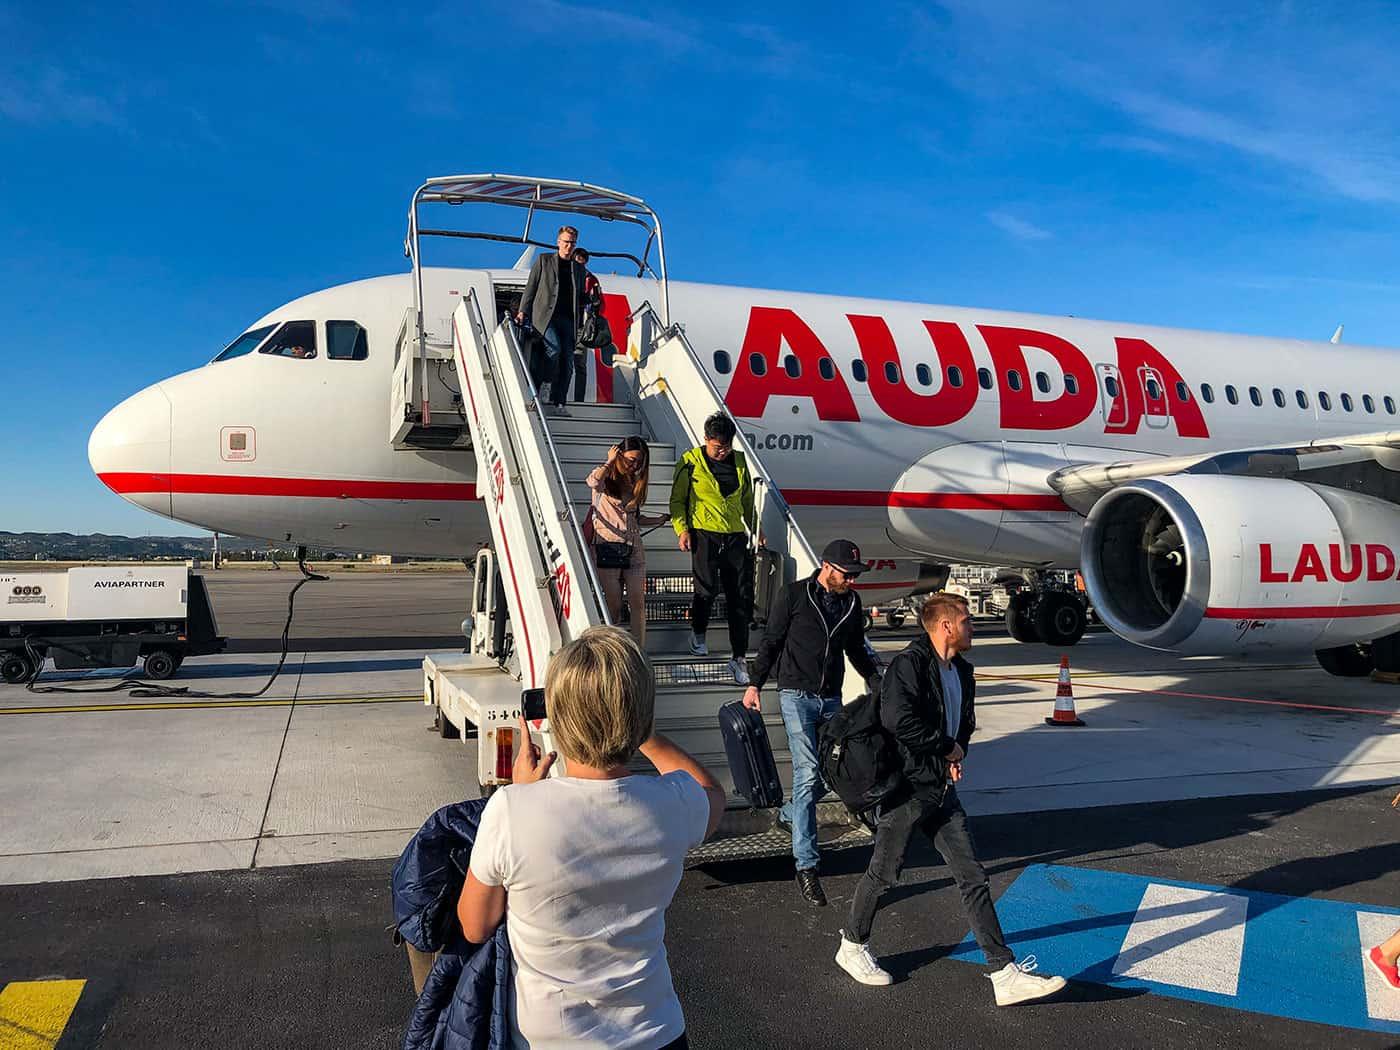 Lauda A320 in Marseille